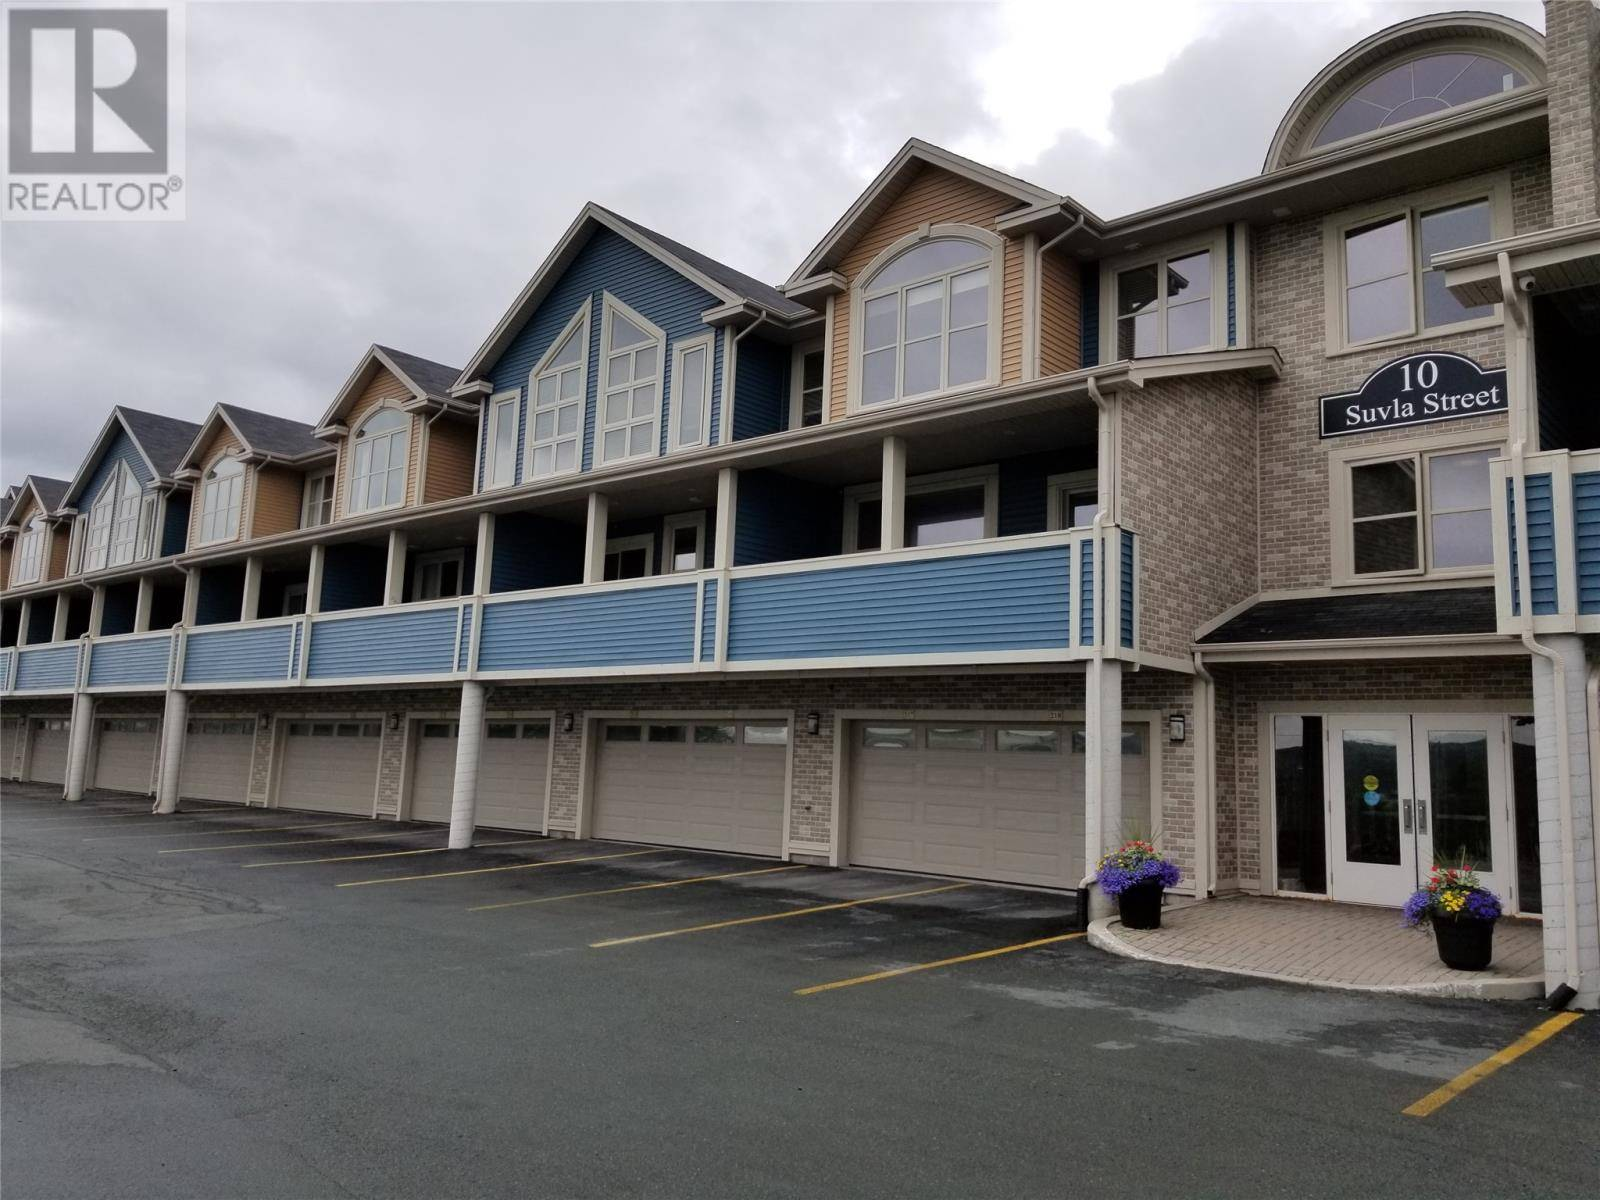 House for sale at 10 Suvla St Unit 108 St. John's Newfoundland - MLS: 1200559